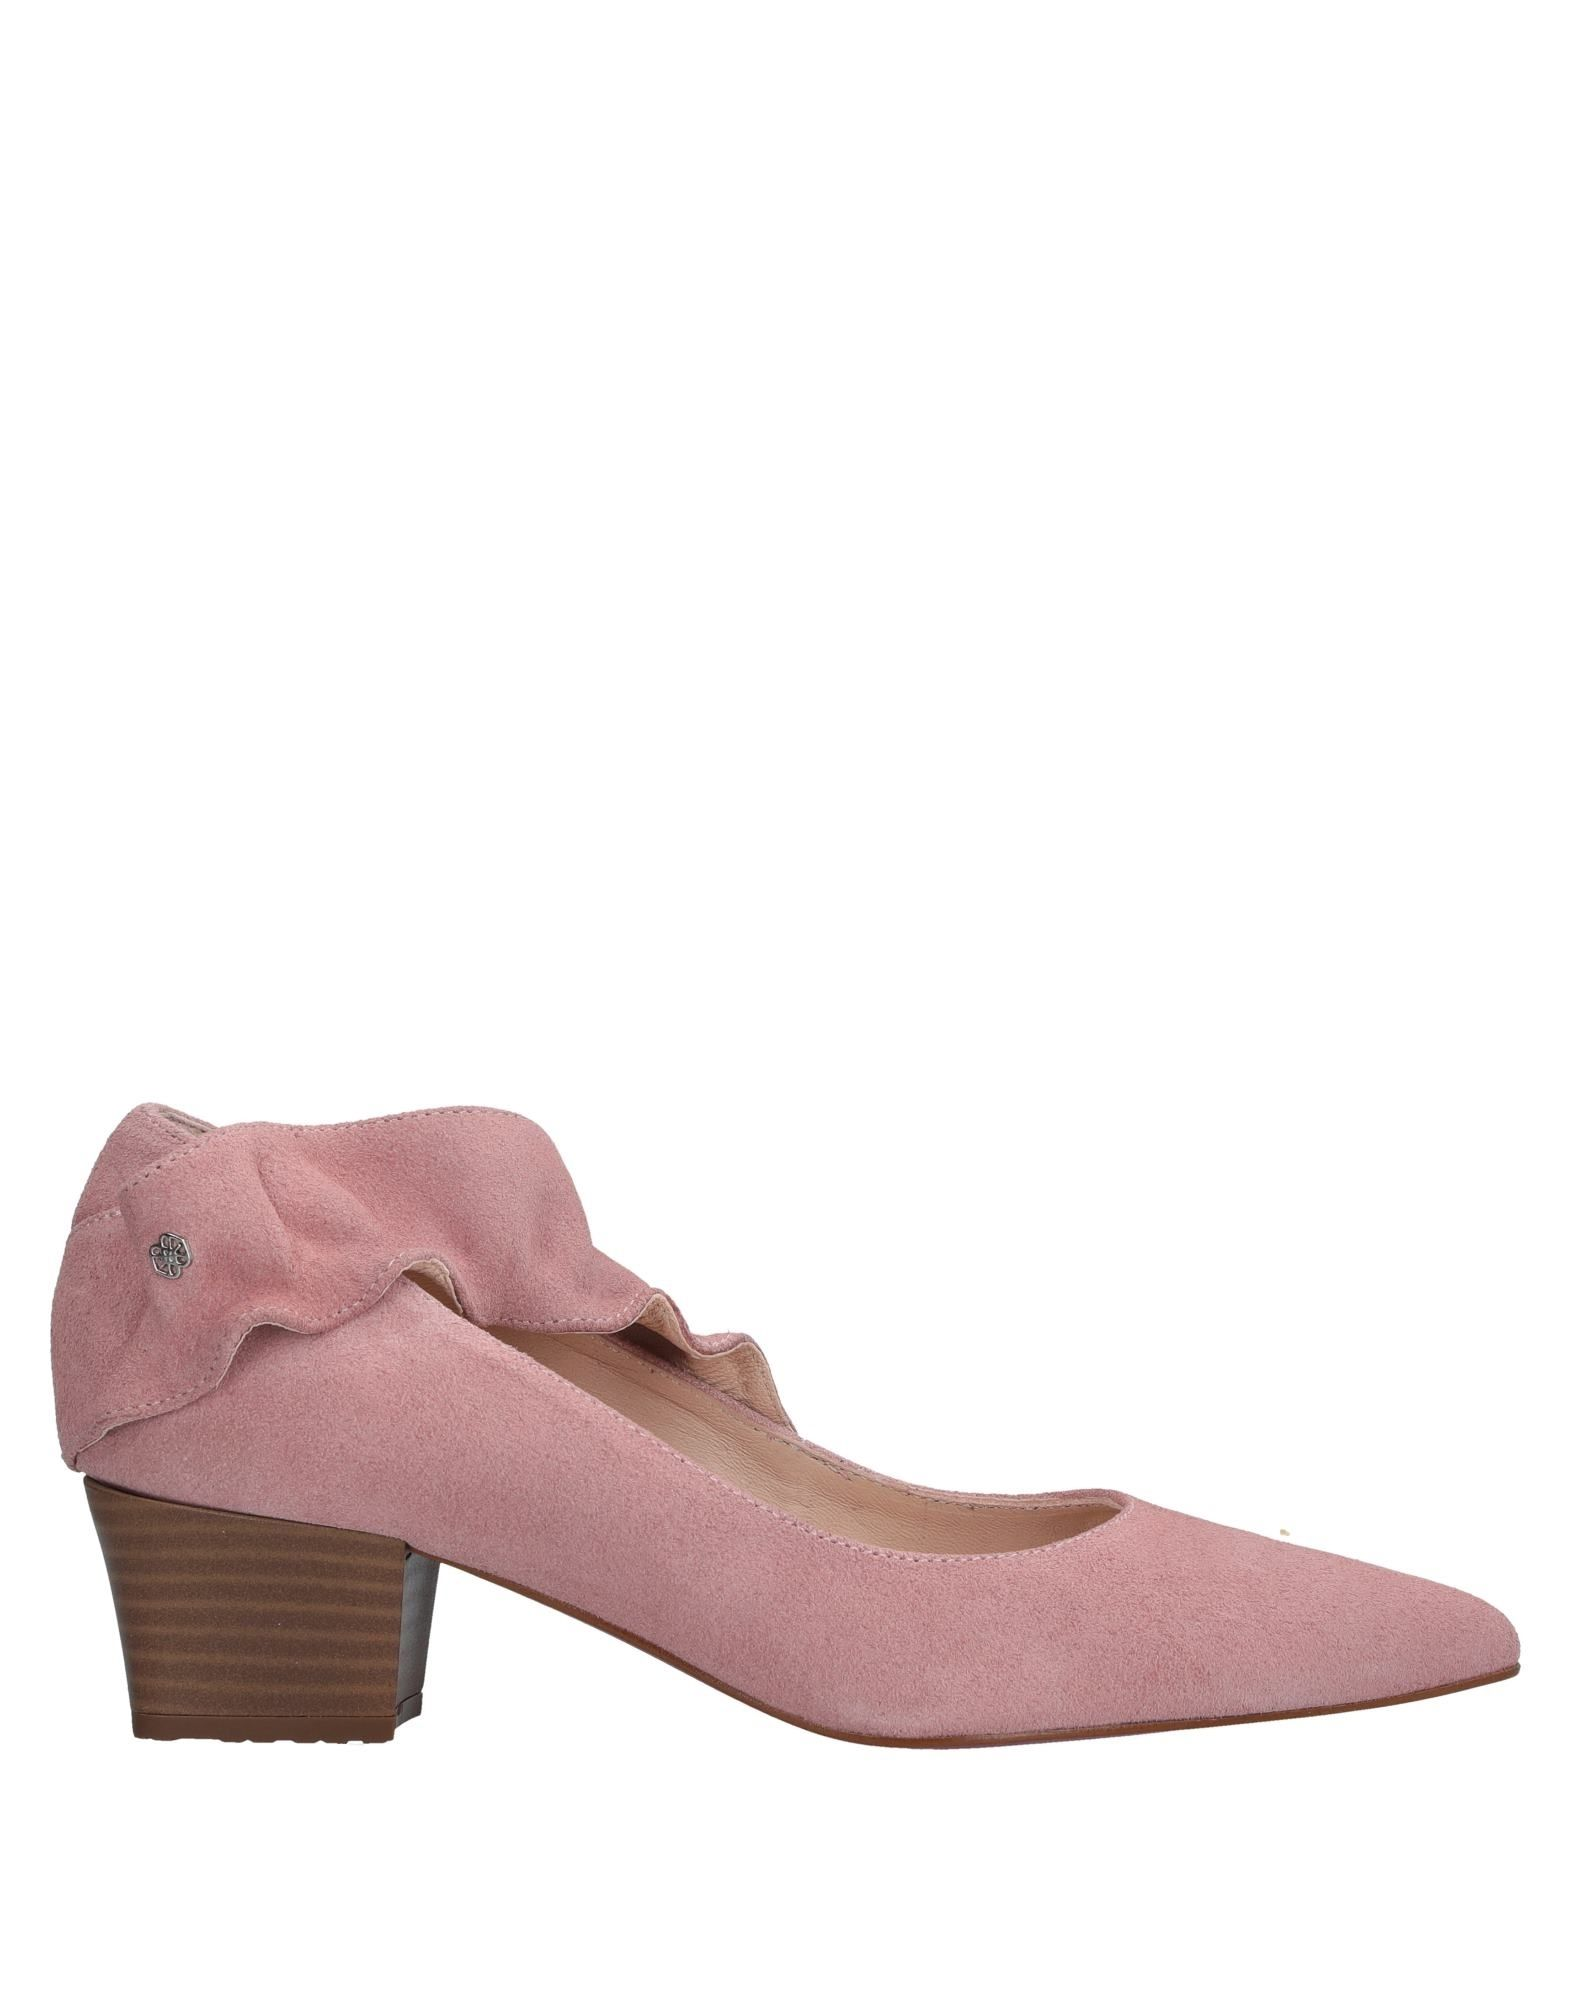 Mocassino Chocolà offerte Donna - 11526969BX Nuove offerte Chocolà e scarpe comode 4ef1f5